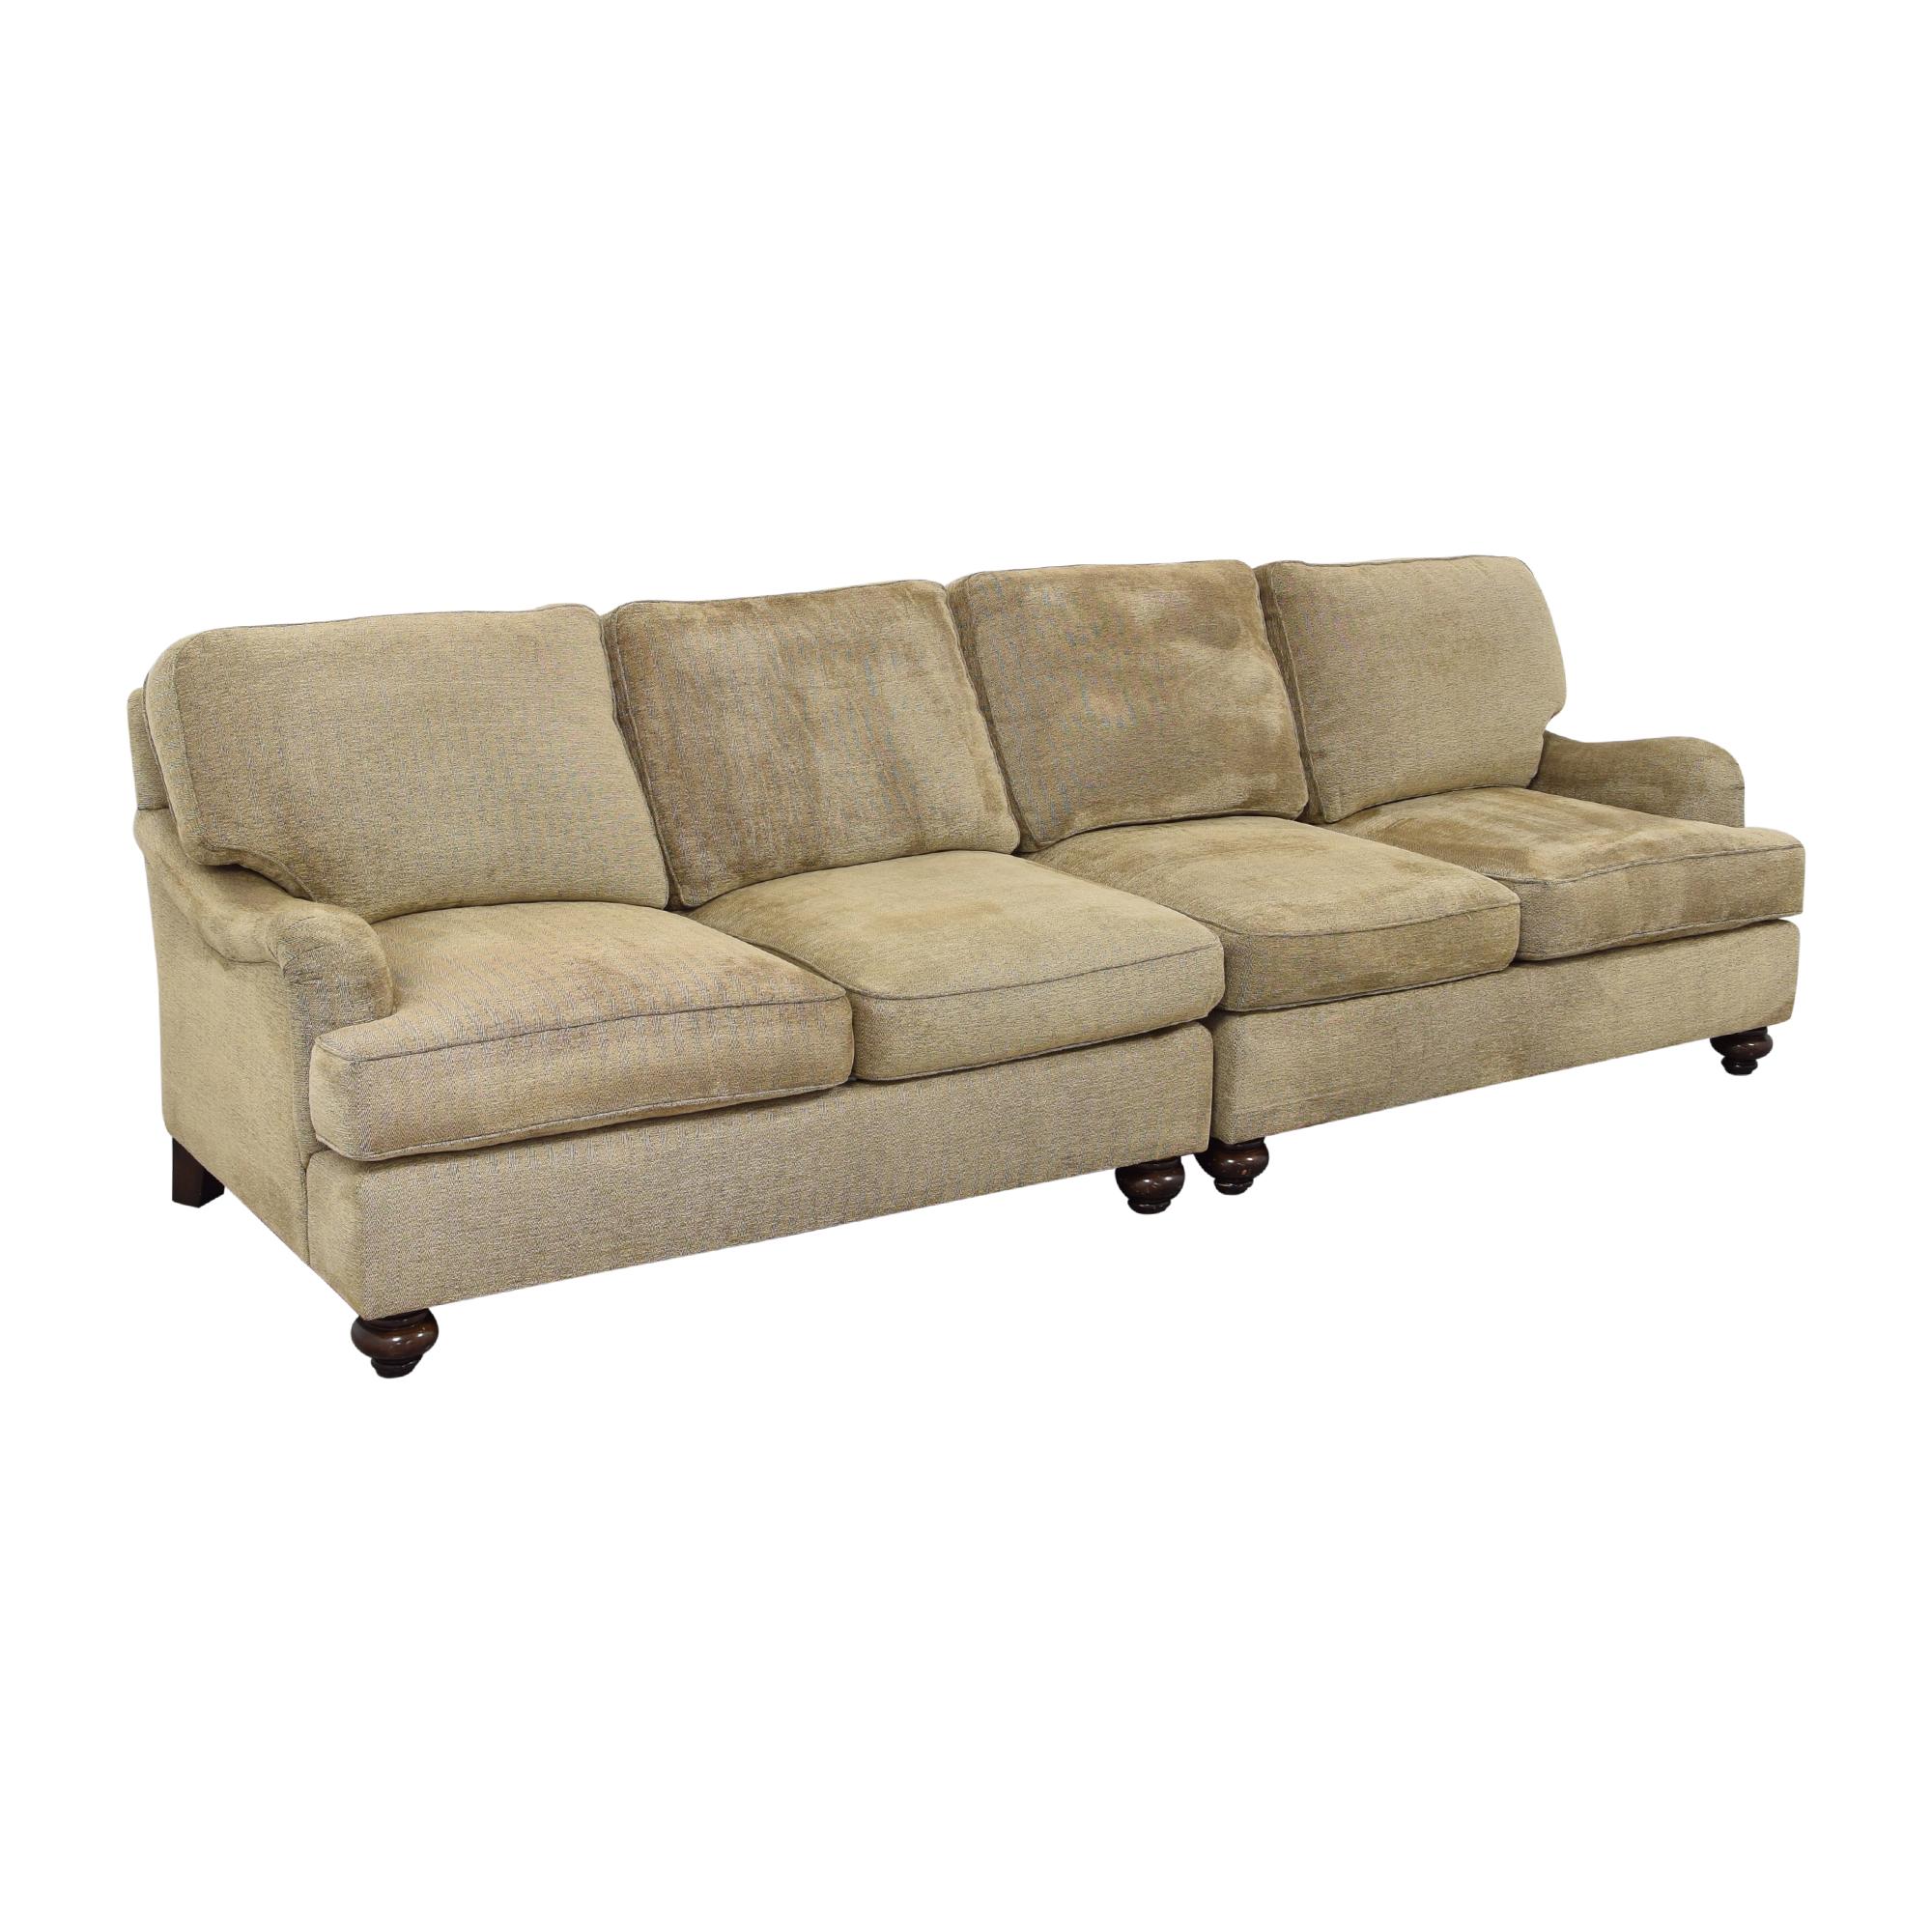 Henredon Furniture Mid-Century Modern Couch / Sofas